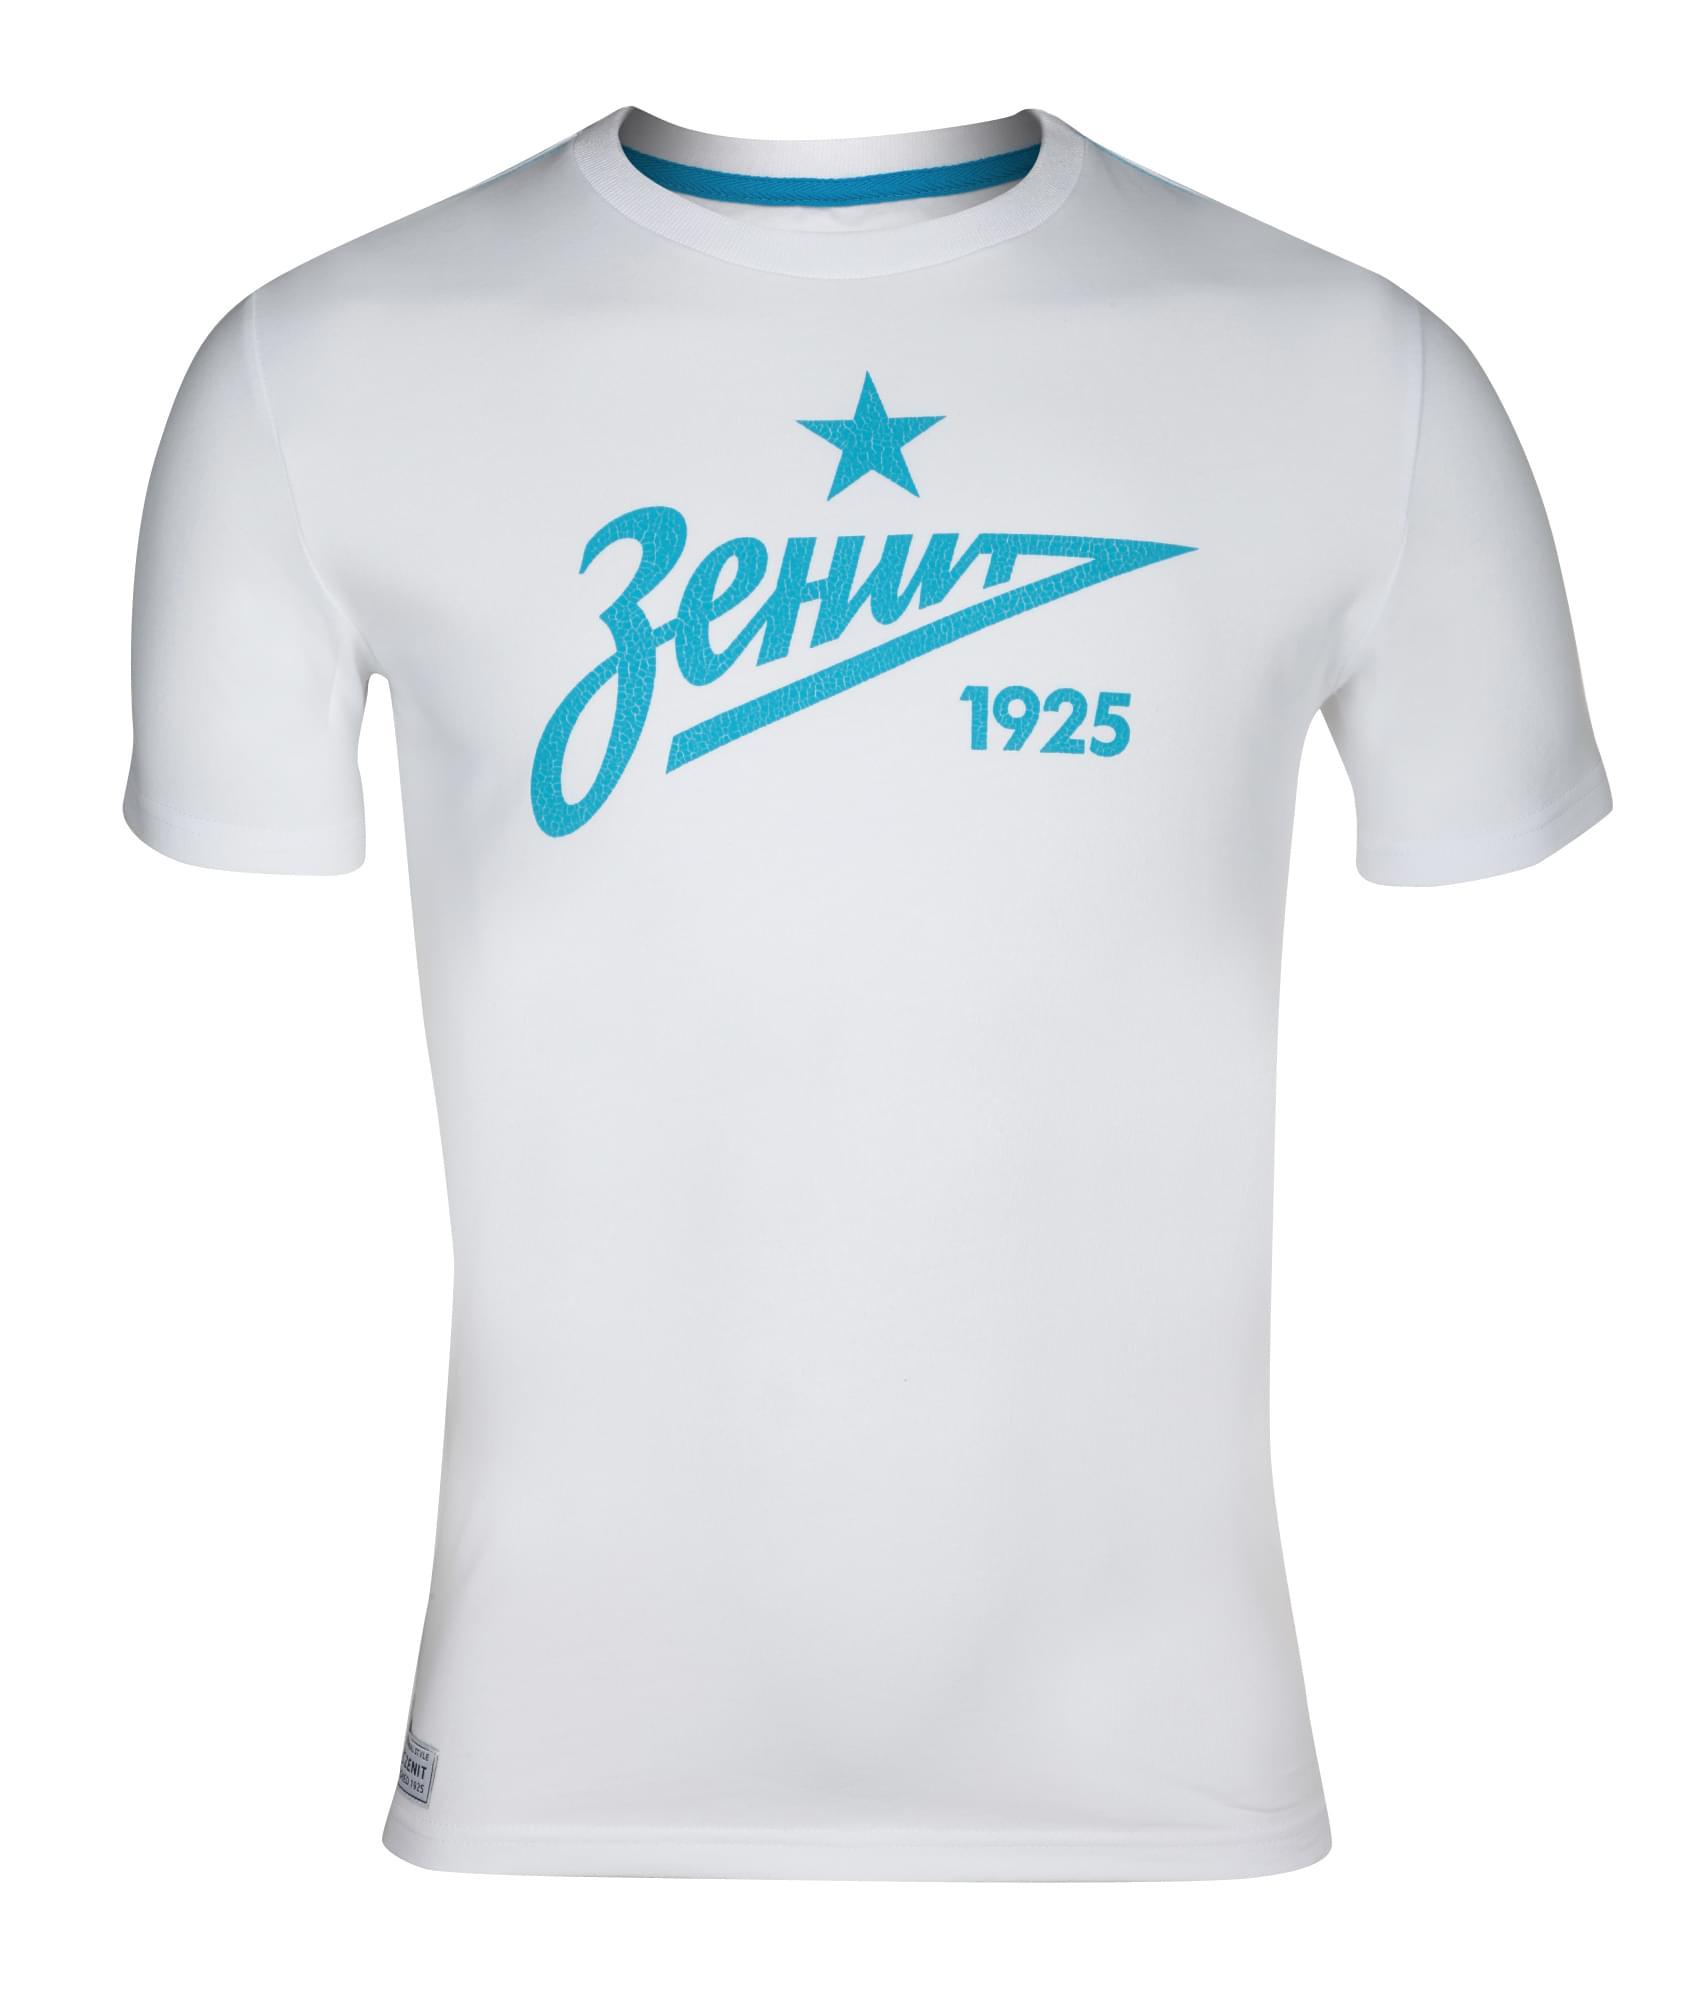 Мужская футболка, Цвет-Белый, Размер-XXL футболка lasting dingo 6262 xxl мужская